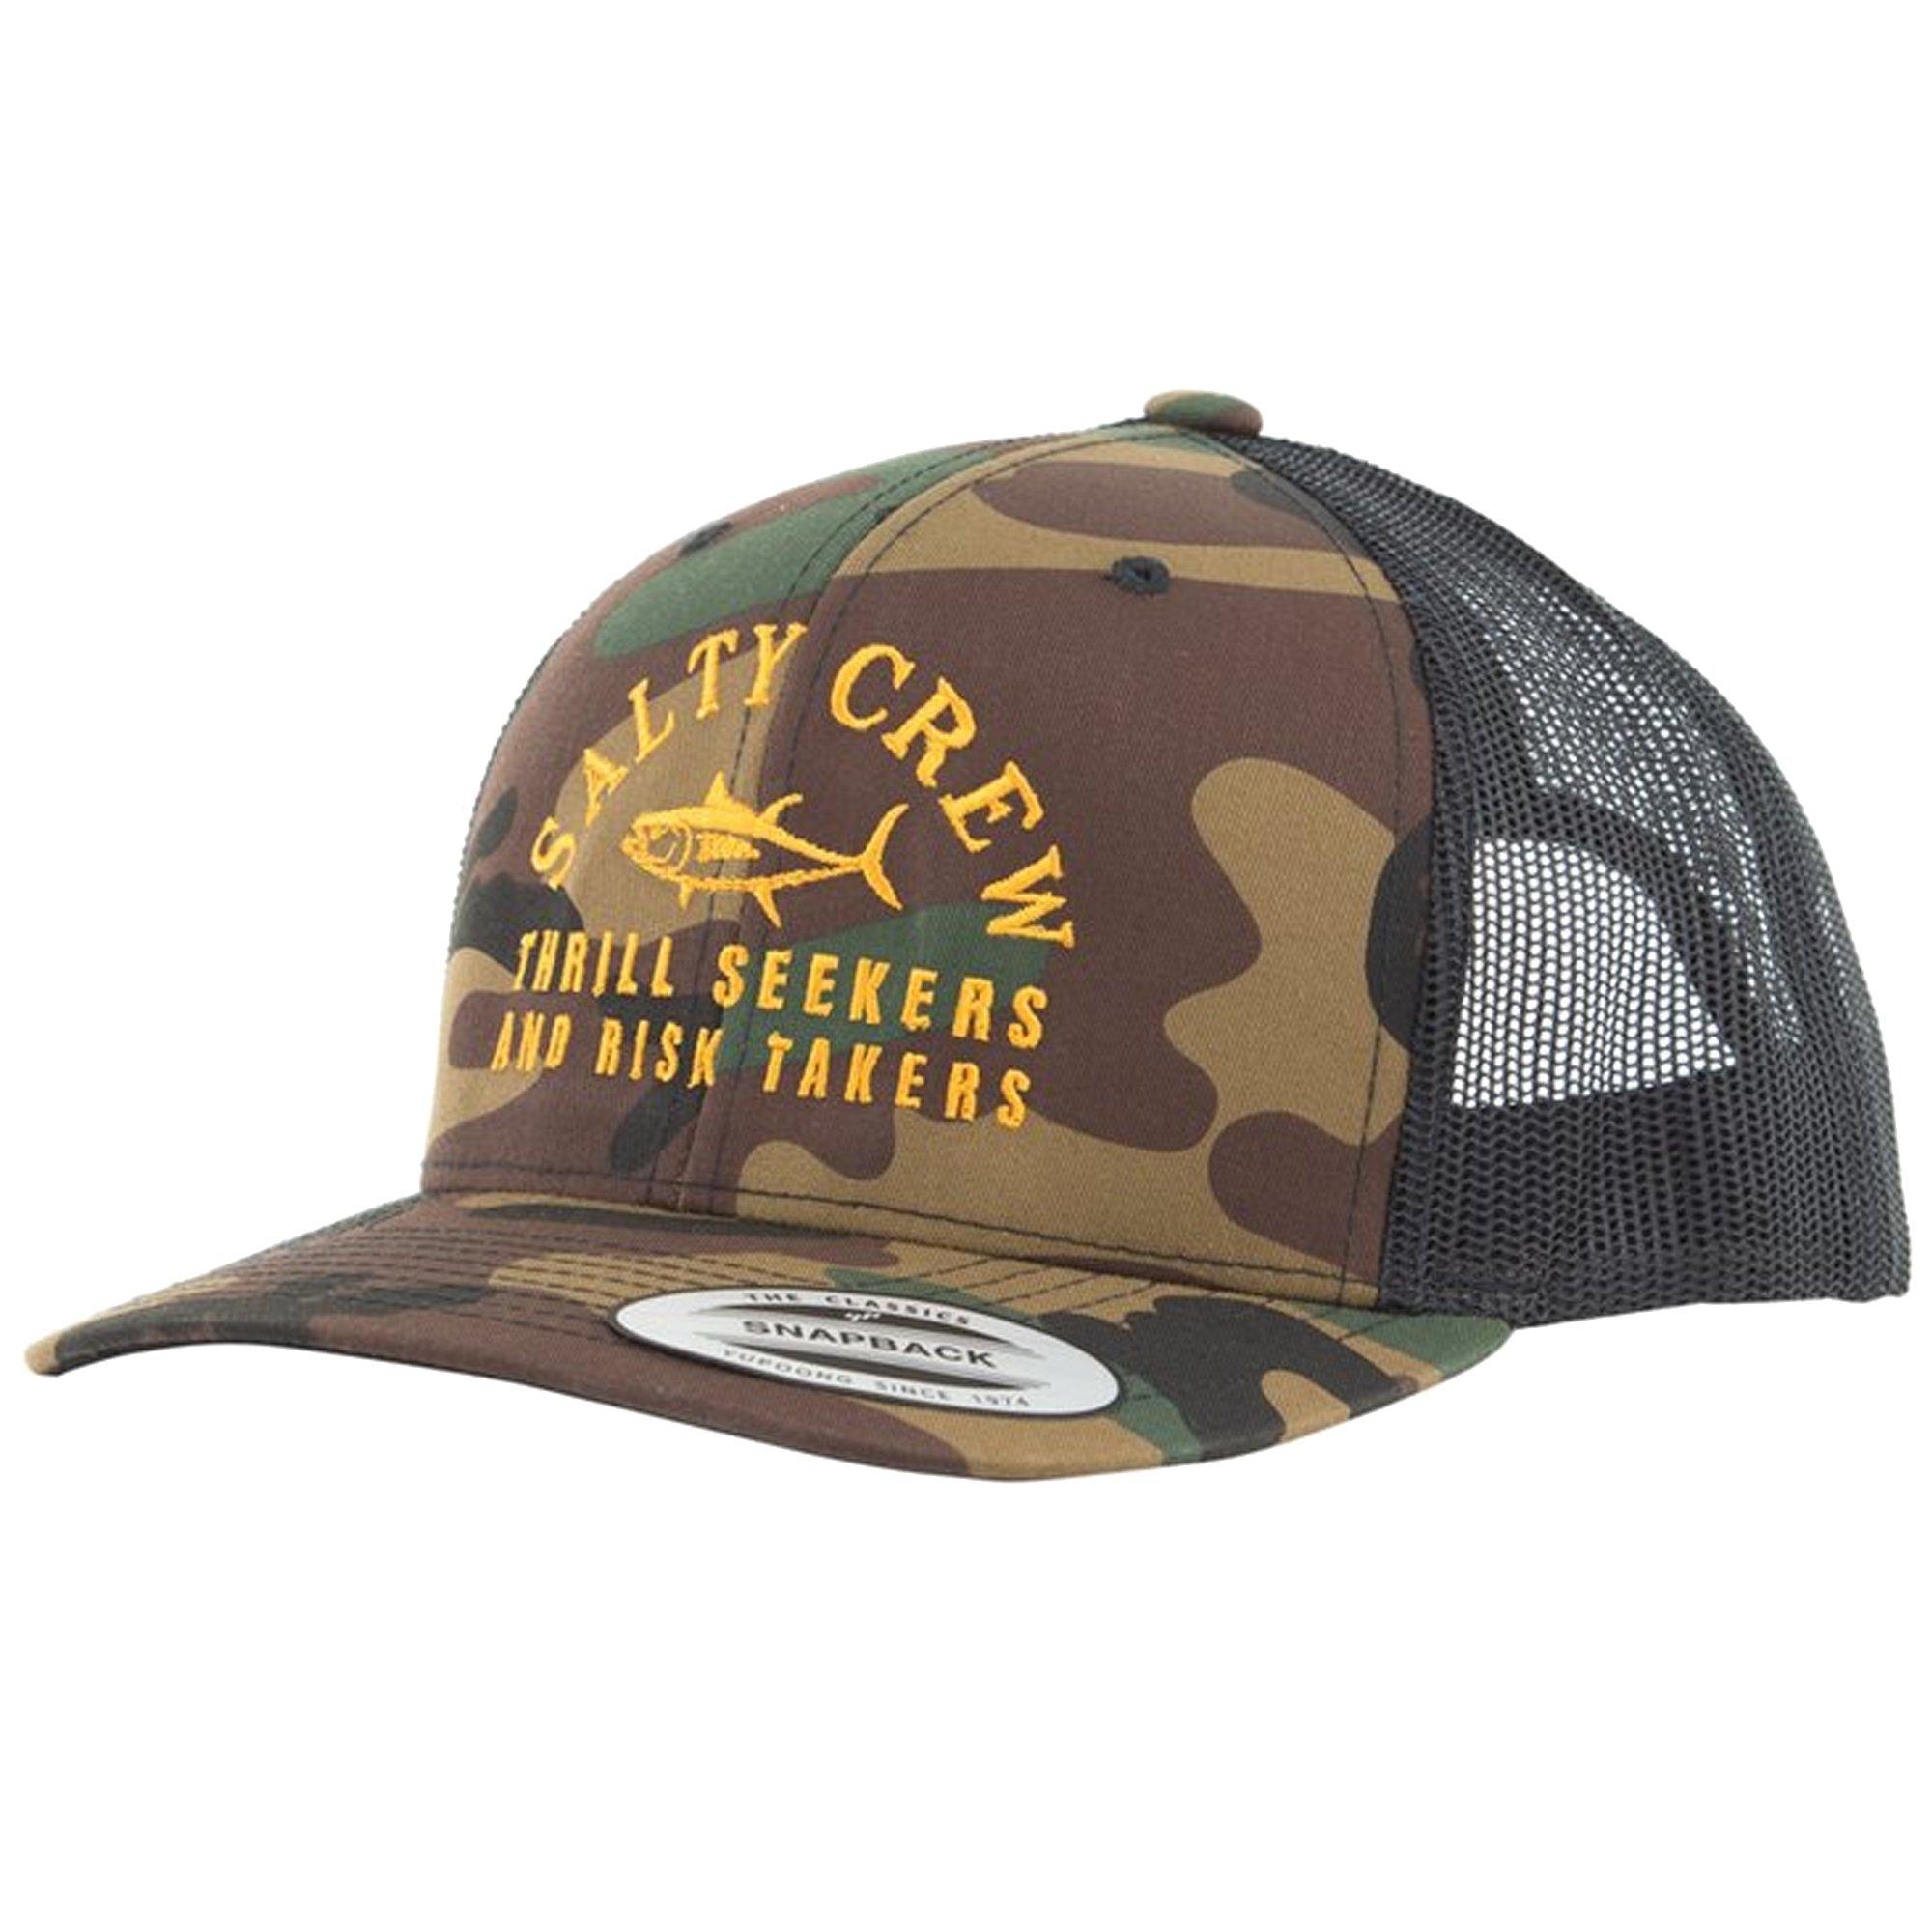 low priced 17ede 5c5bf Salty Crew Men s Fish Market Retro Trucker Hat, Camo, One Size